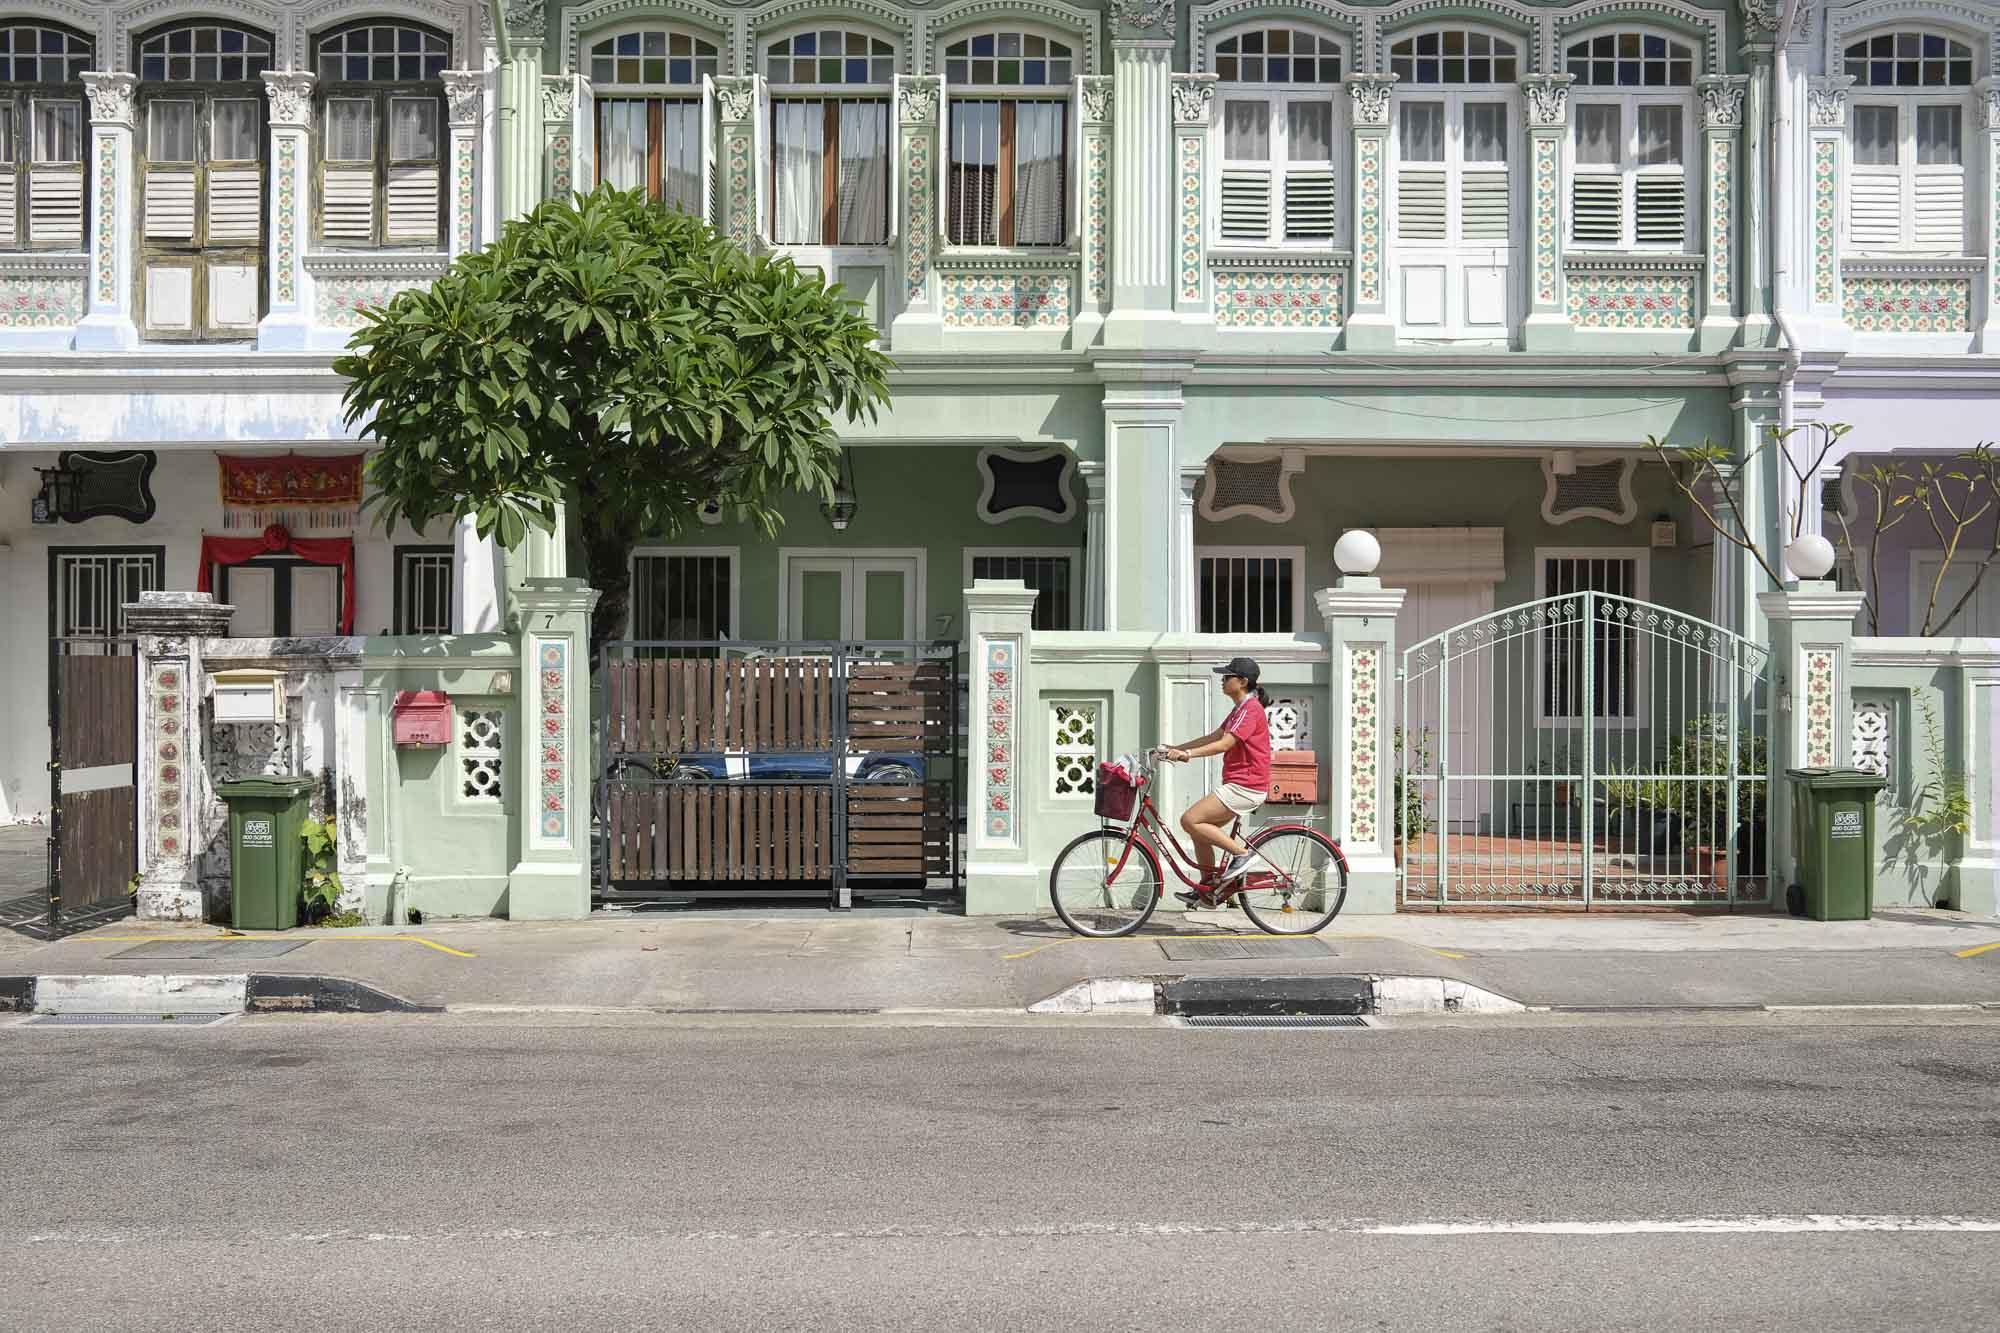 Photowalk with FUJIFILM Photography Workshop Shophouse Singapore COCO Creative Studio 5